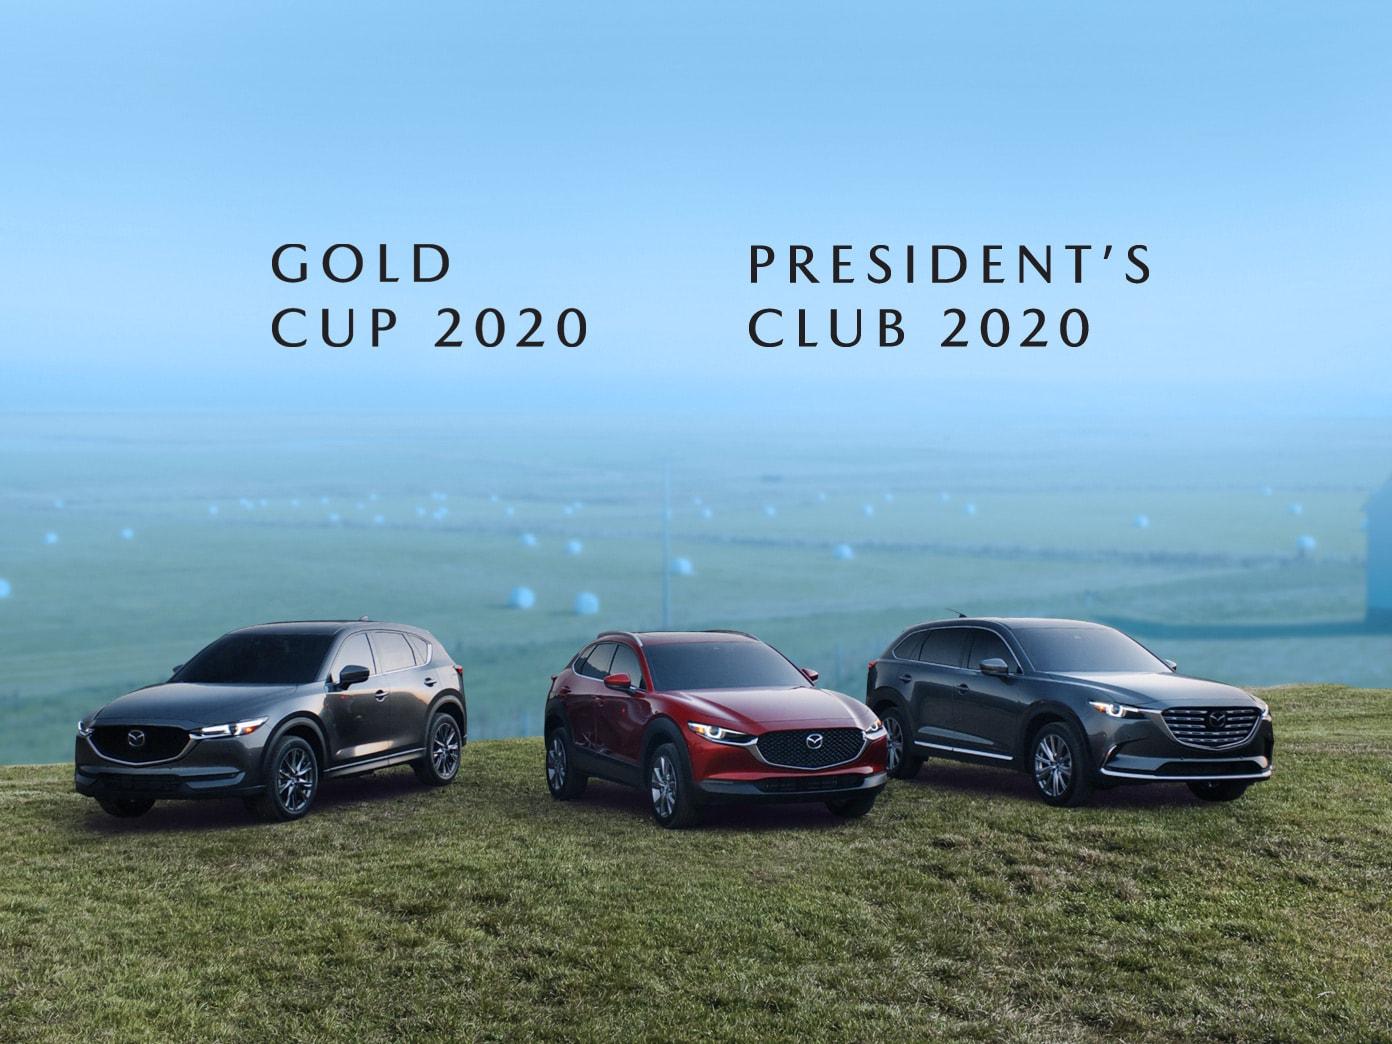 Mazda Gold Cup Presidents Club 2020